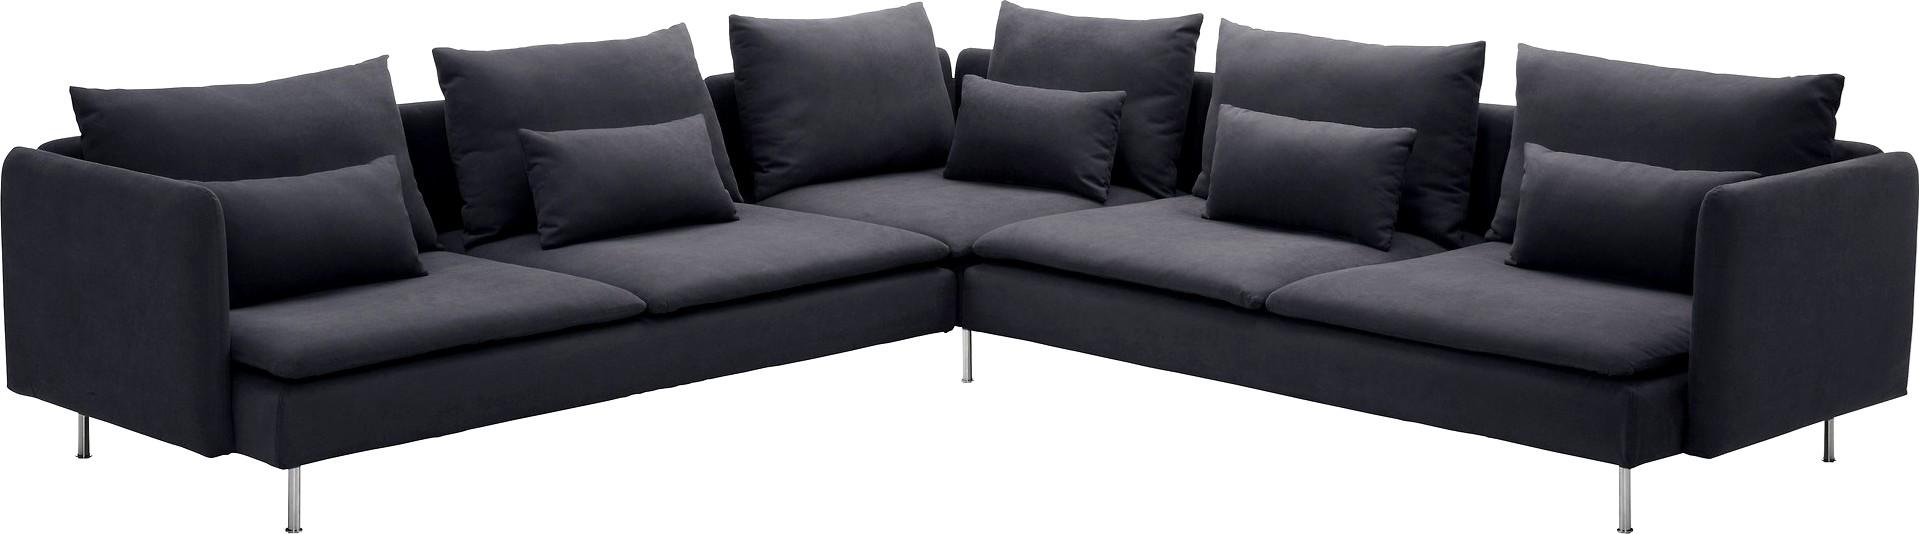 Kose Koltuk Takimi Ikea Dekorstore